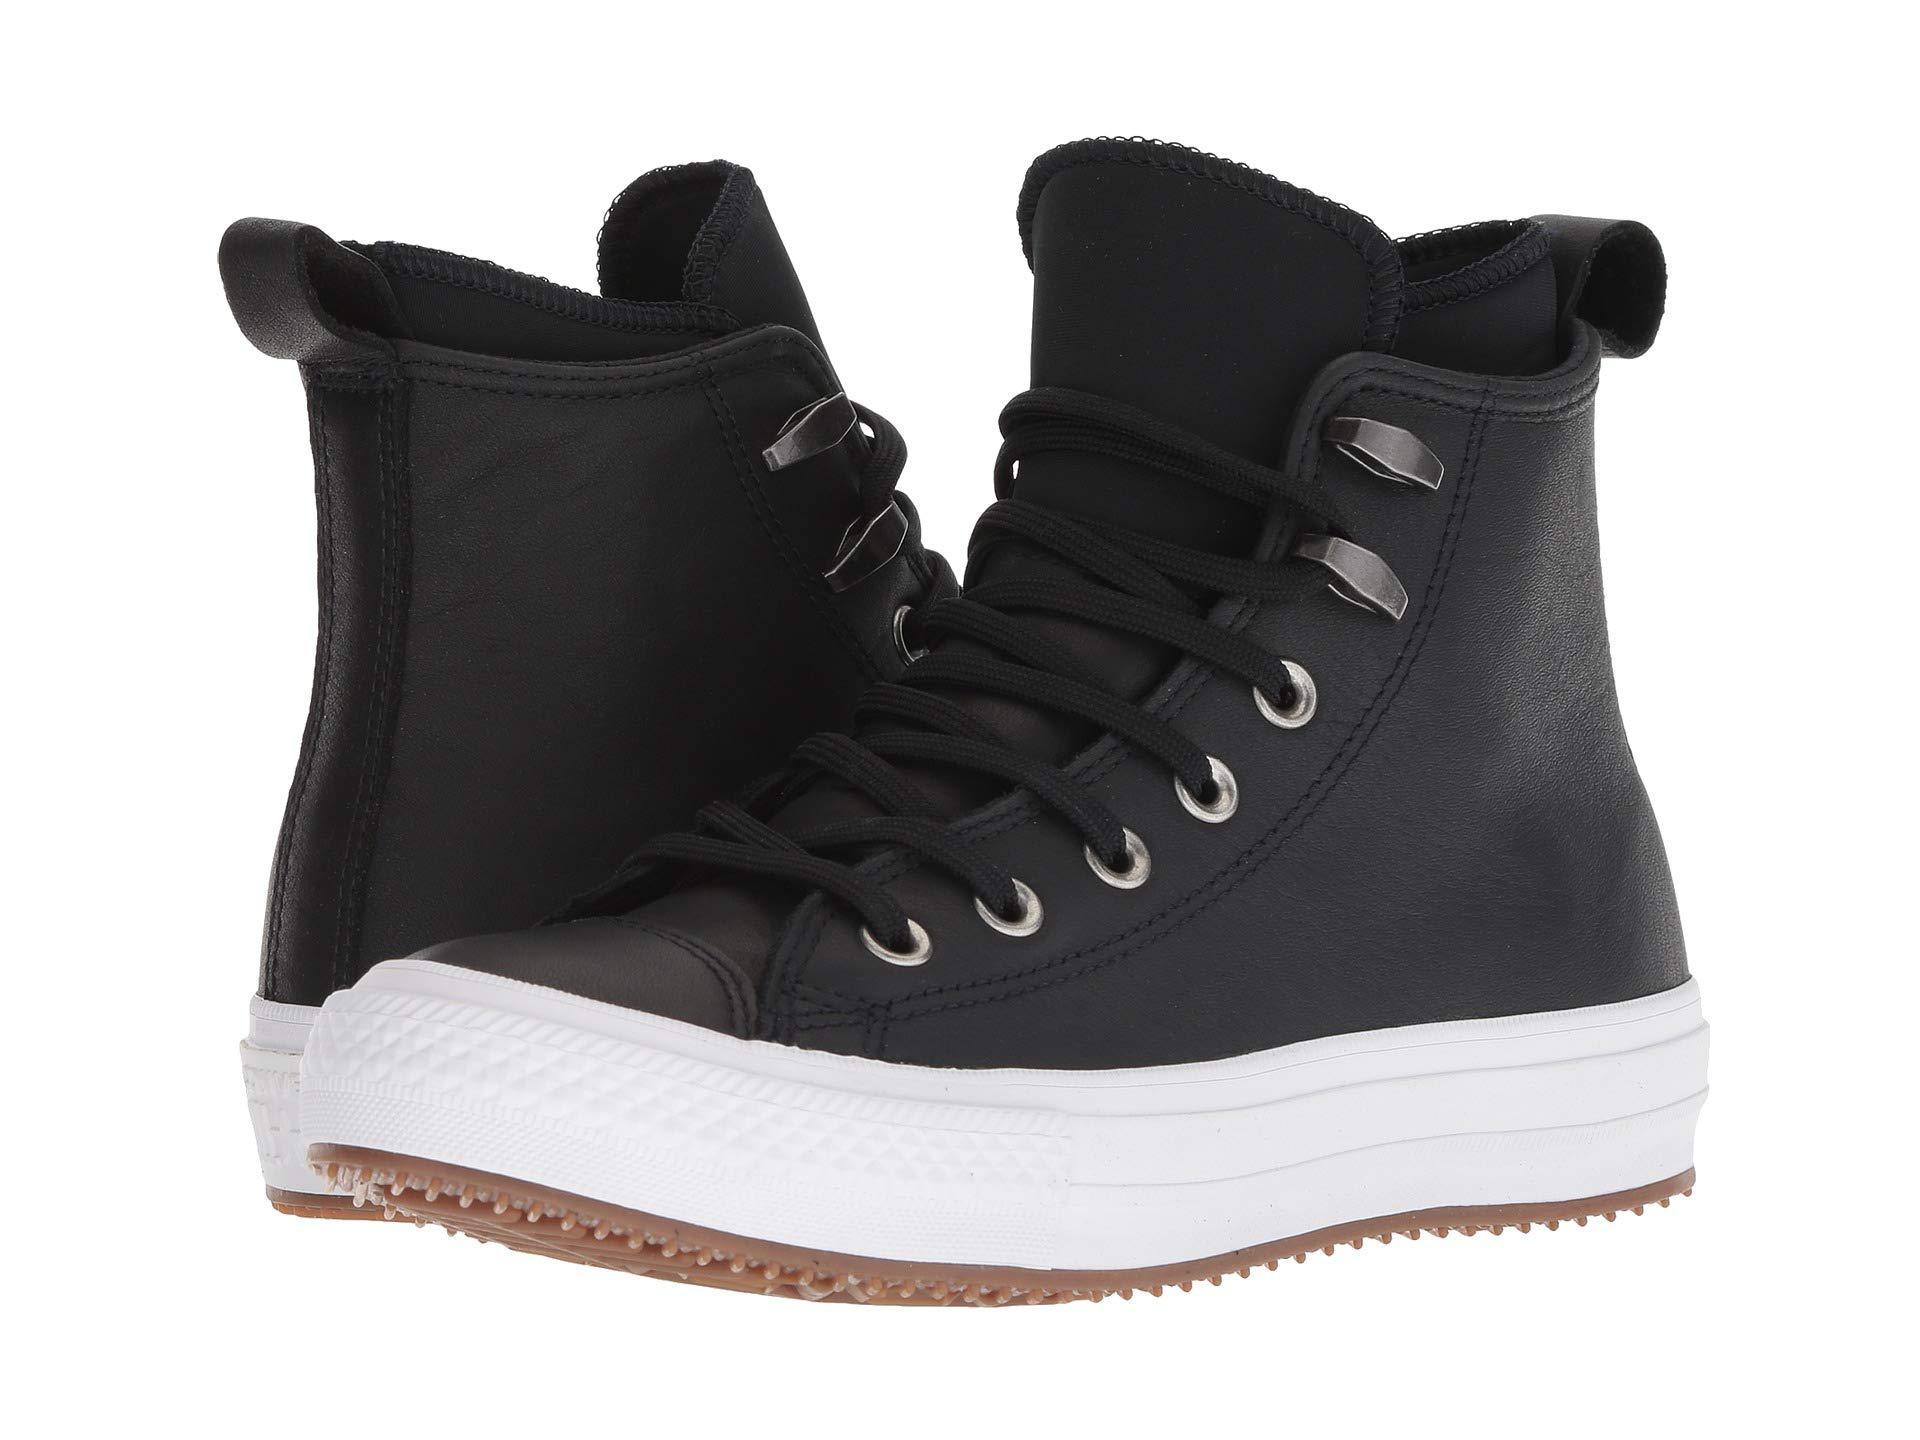 3c2e5f7c007 Lyst - Converse Chuck Taylor All Star Waterproof Boot (black black ...